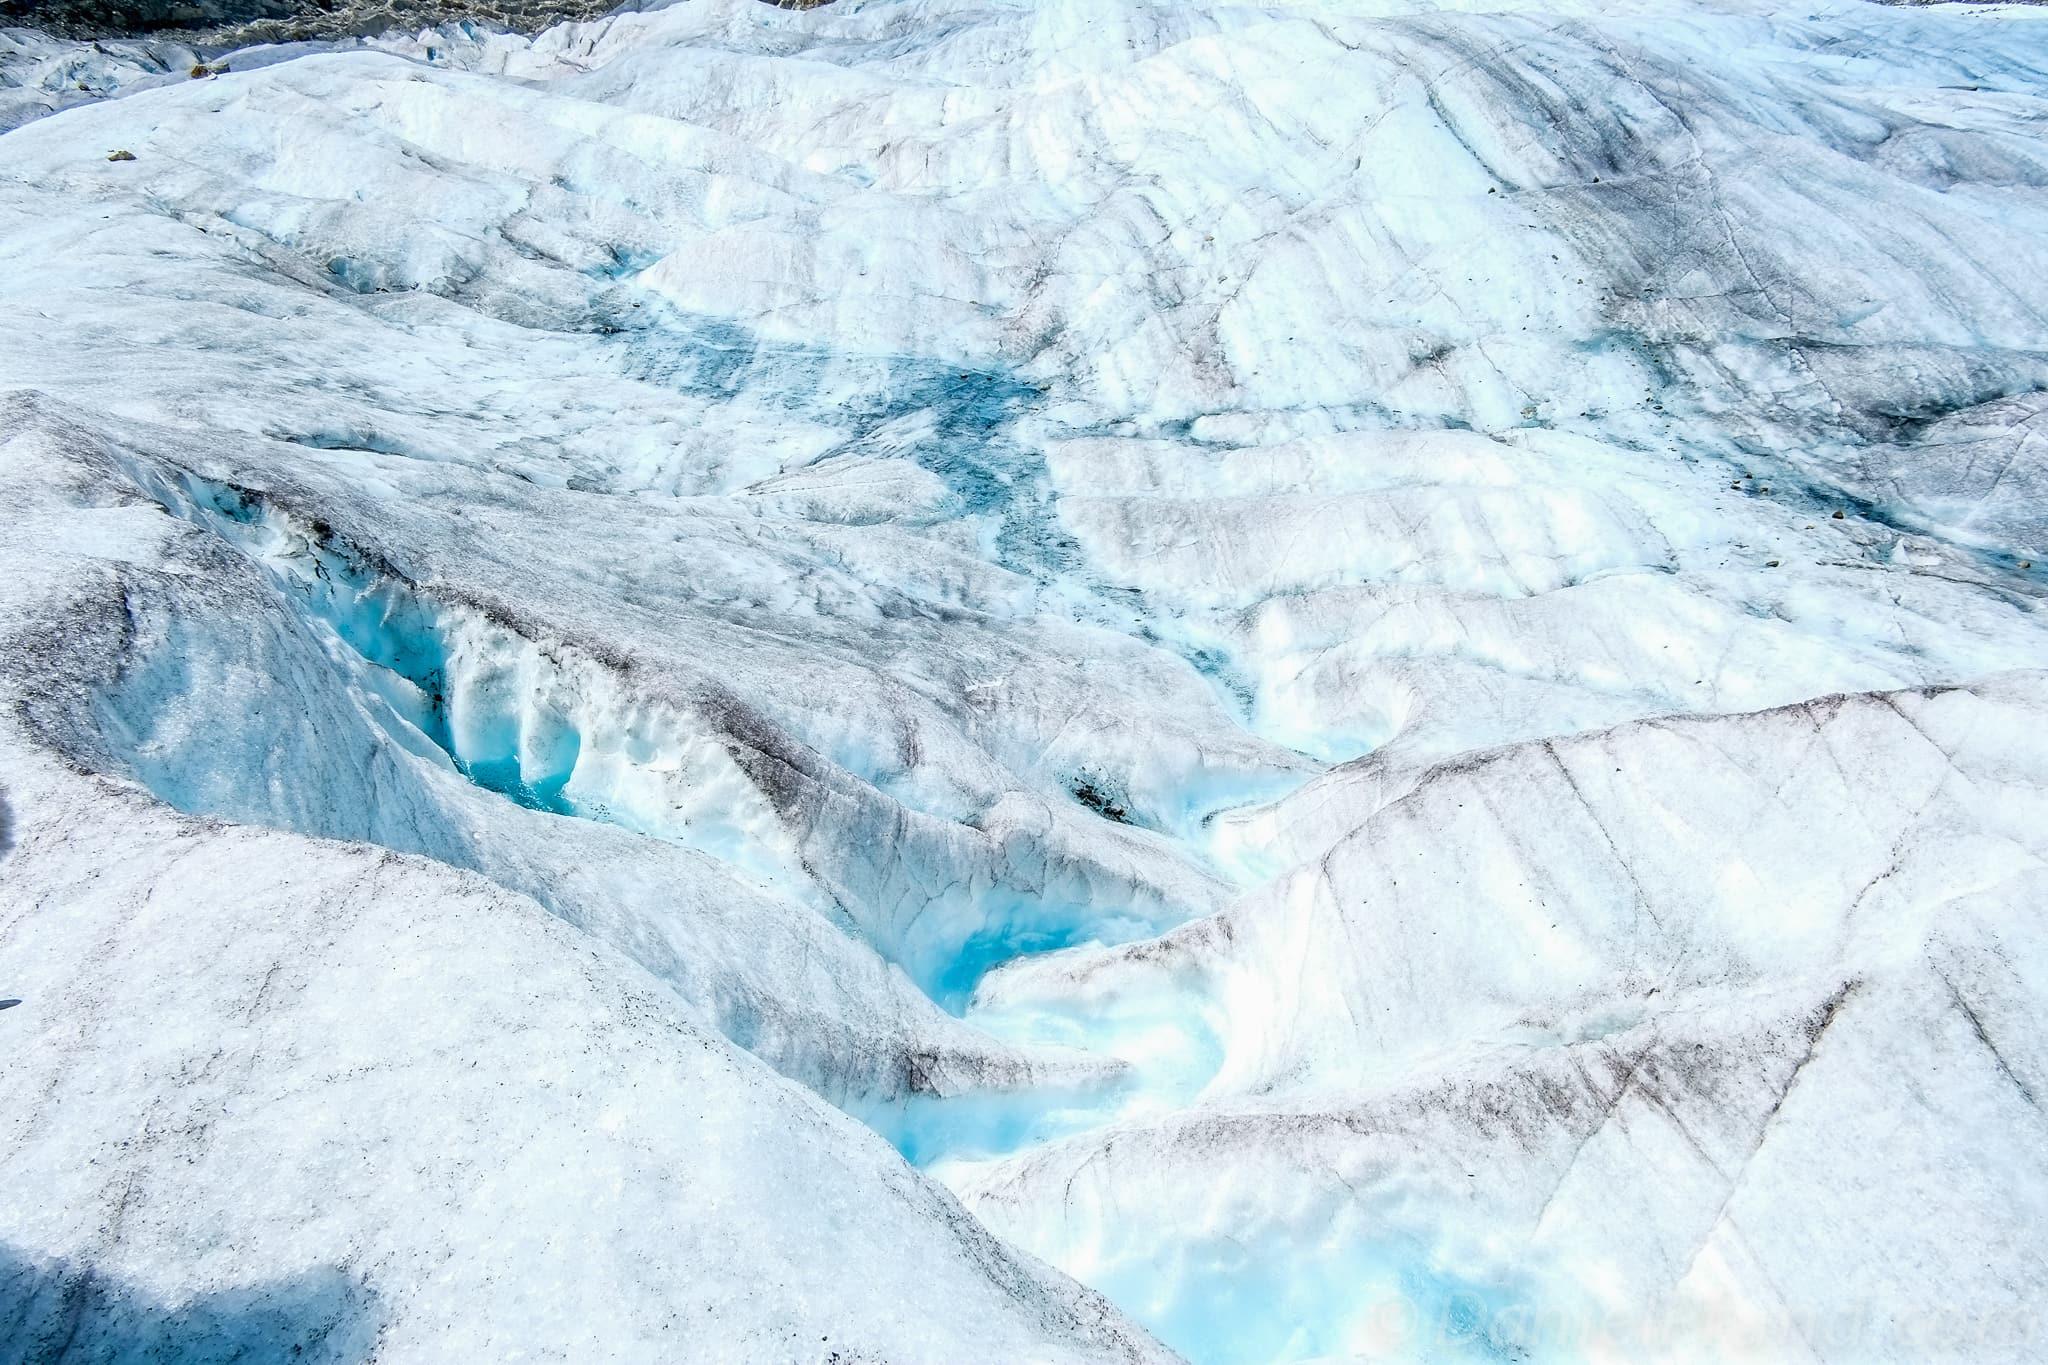 Glacier | https://www.flickr.com/photos/danielpfund/